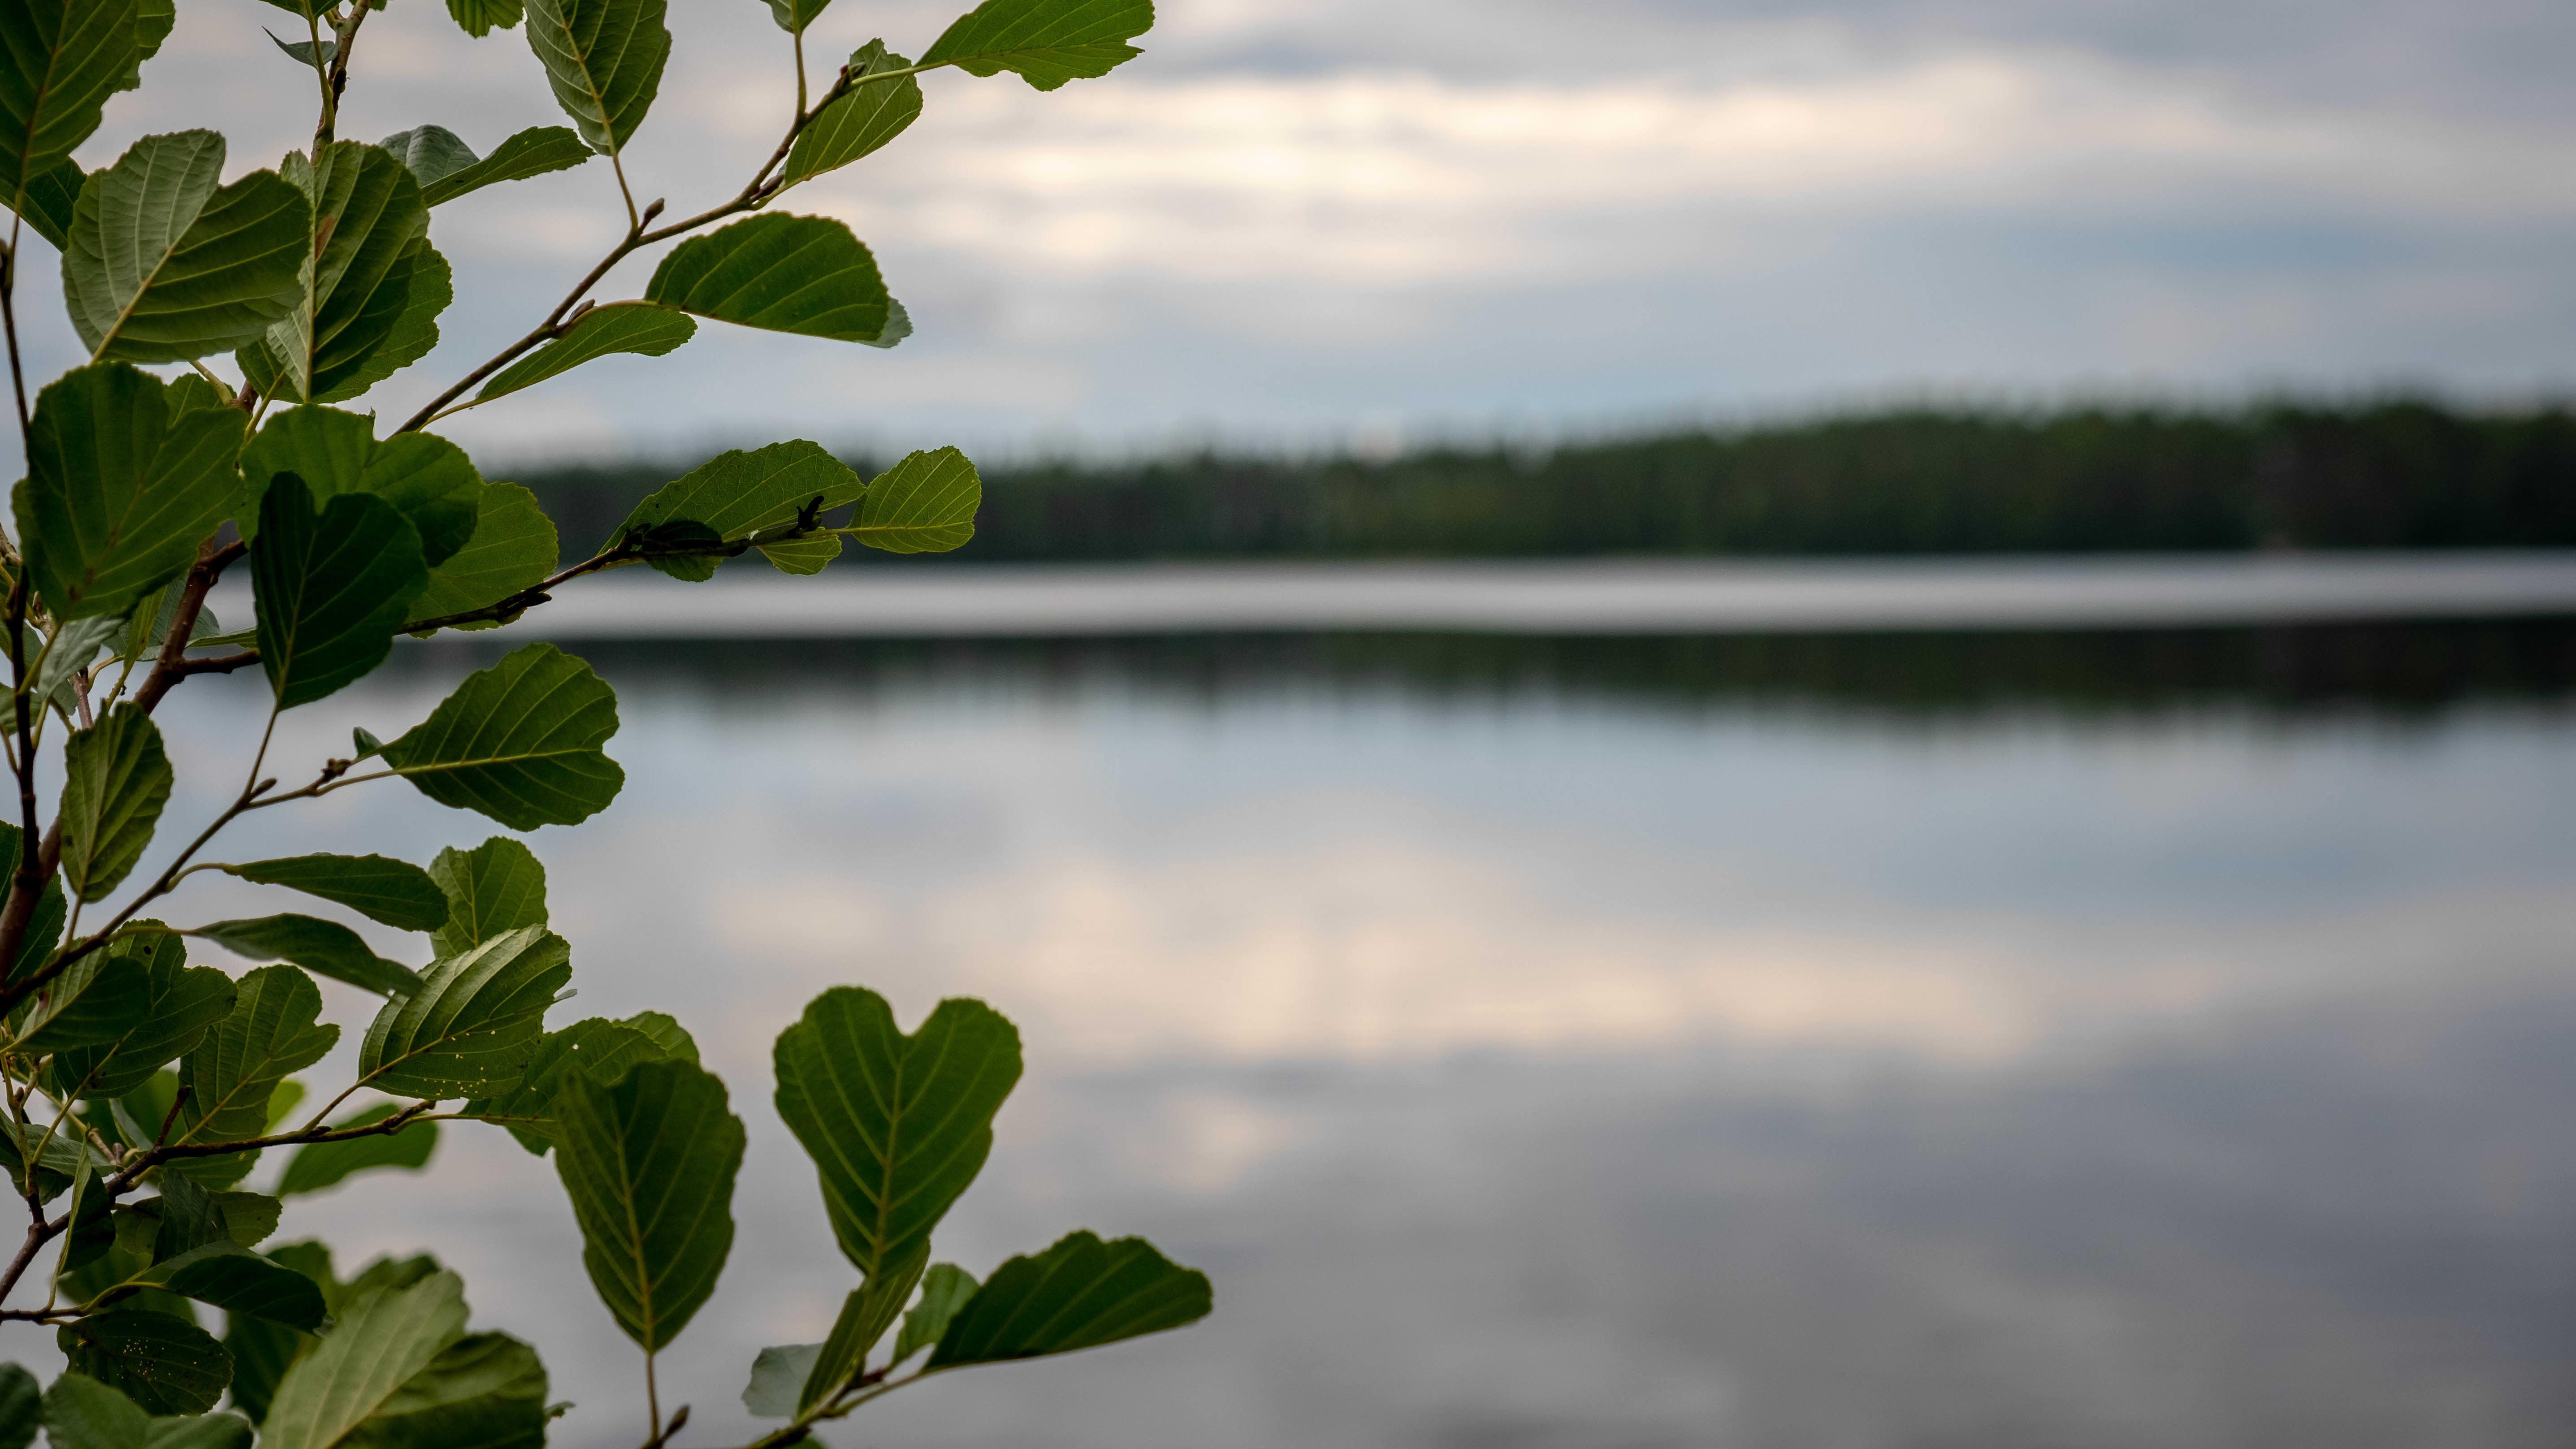 Peilityyni järvi, etualalla lehtipuu, leppä.